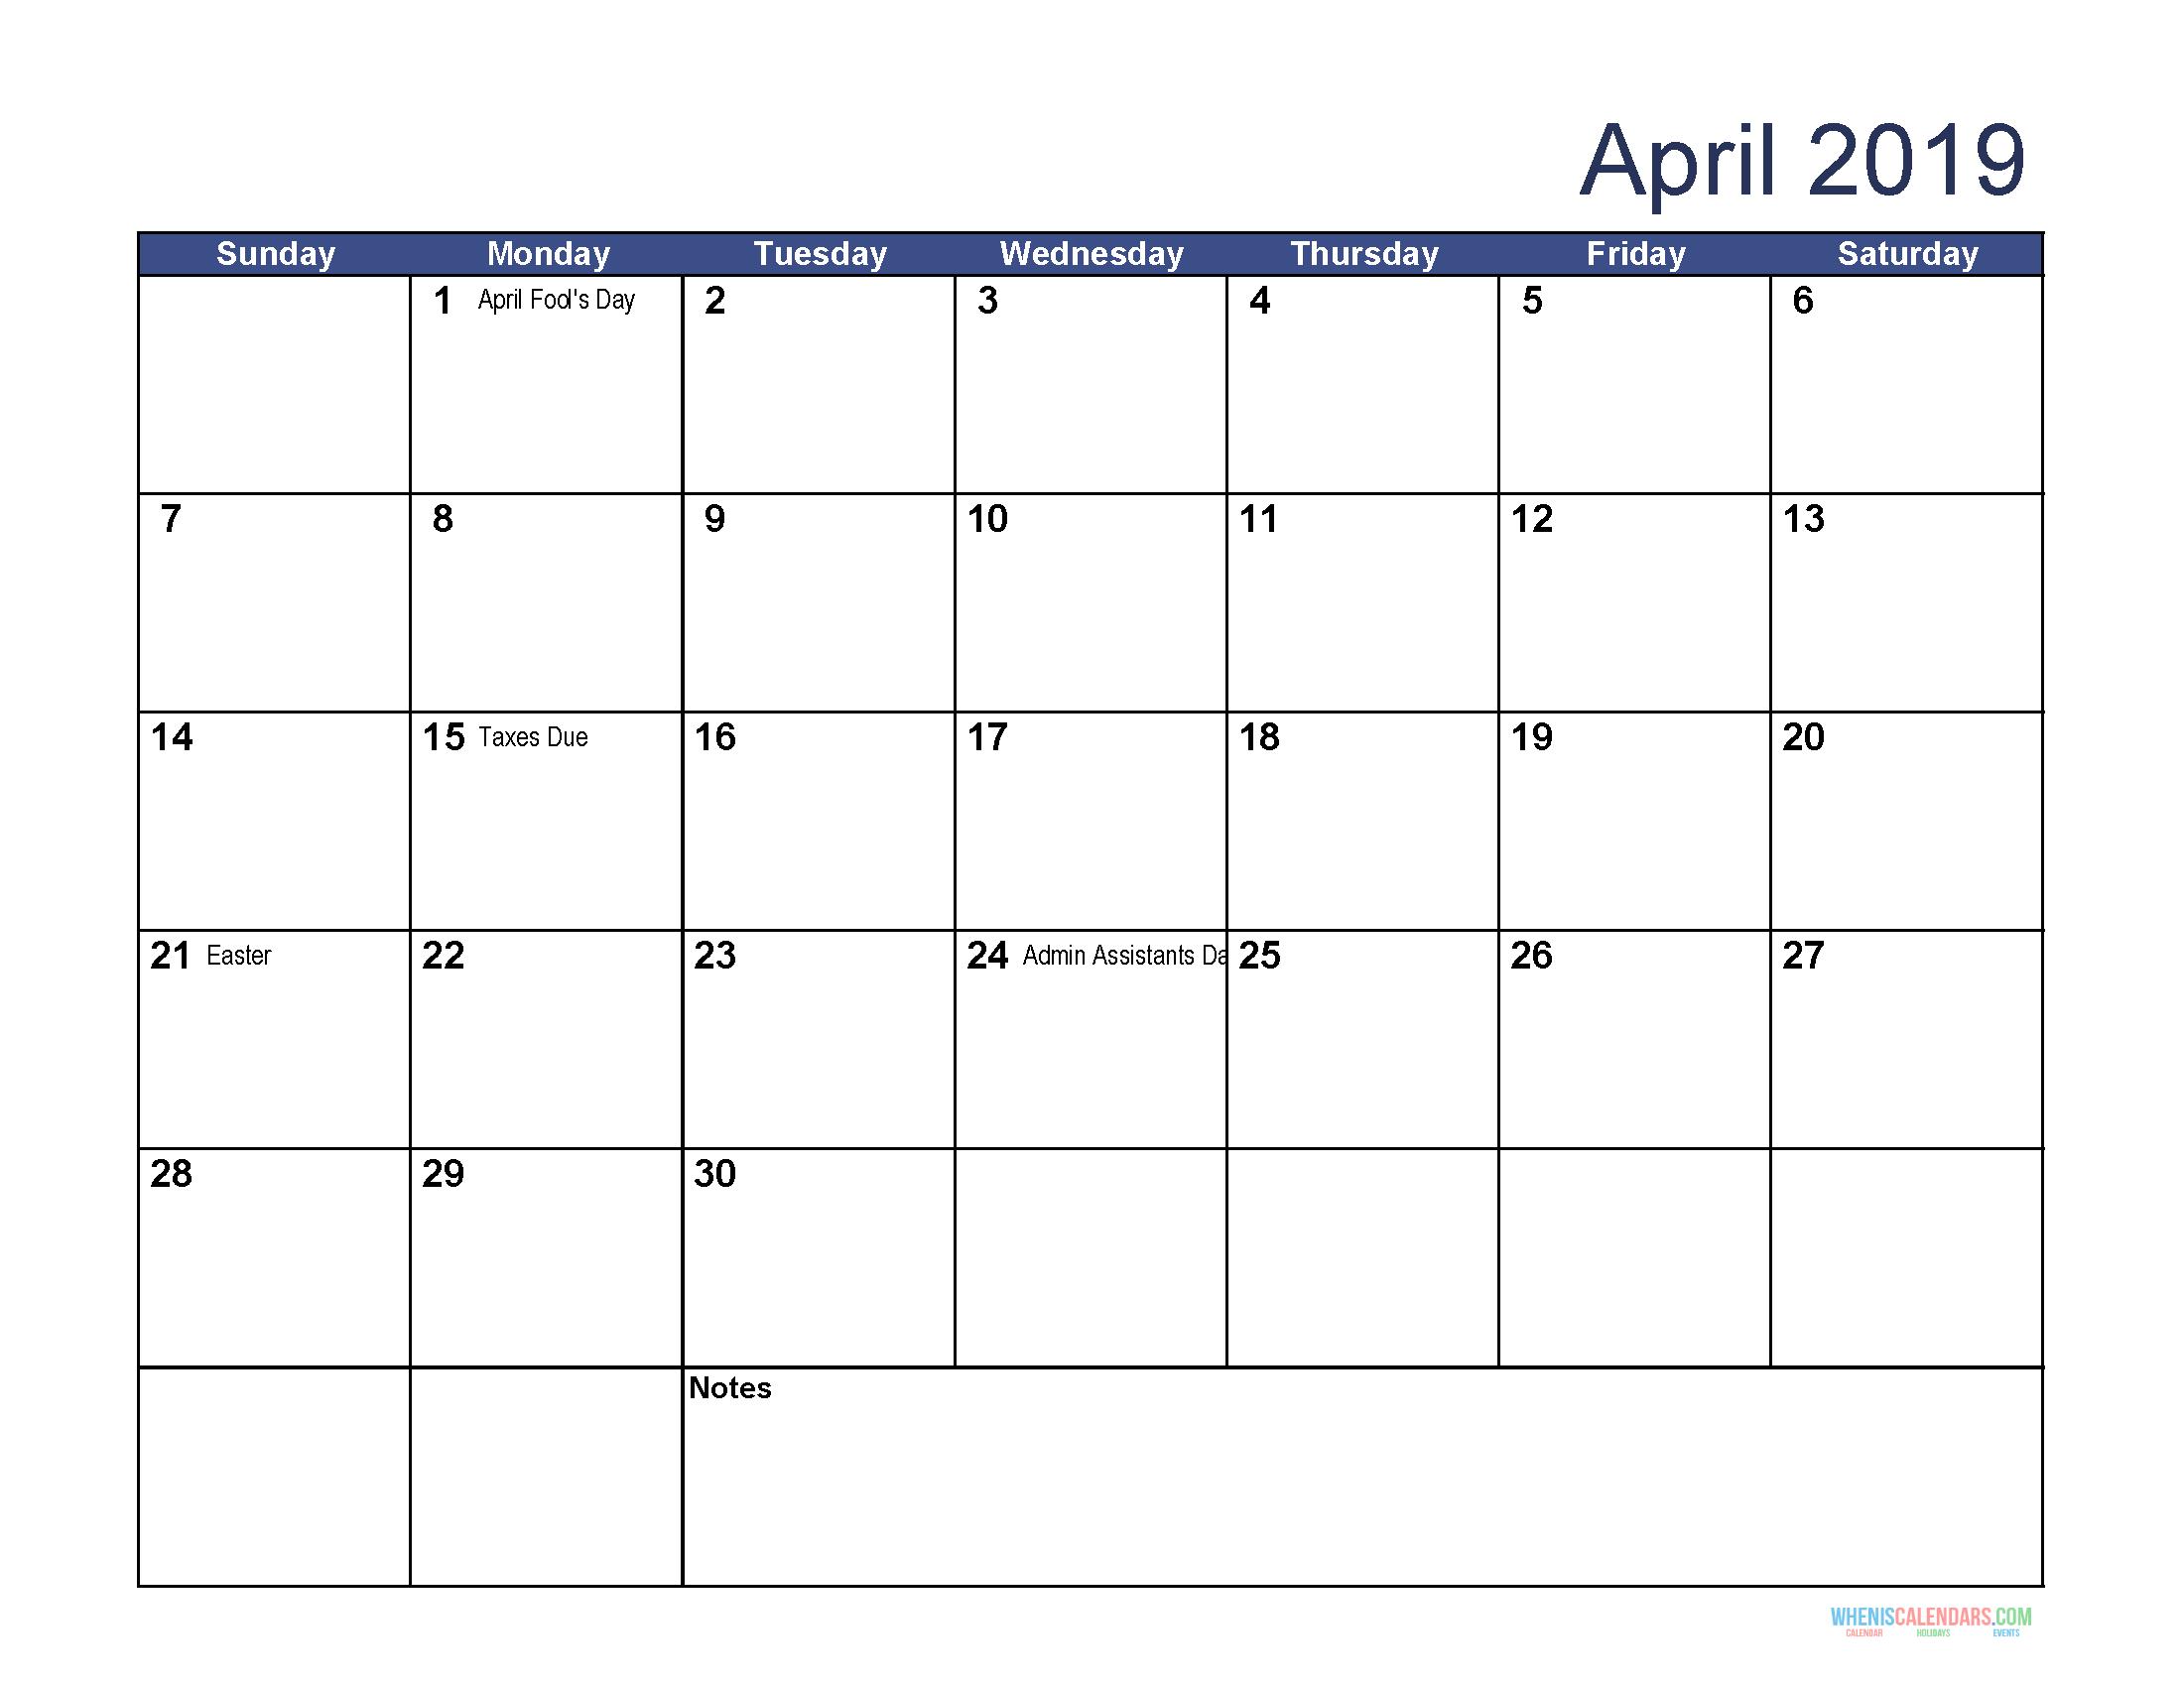 April 2019 Calendar Printable With Holidays